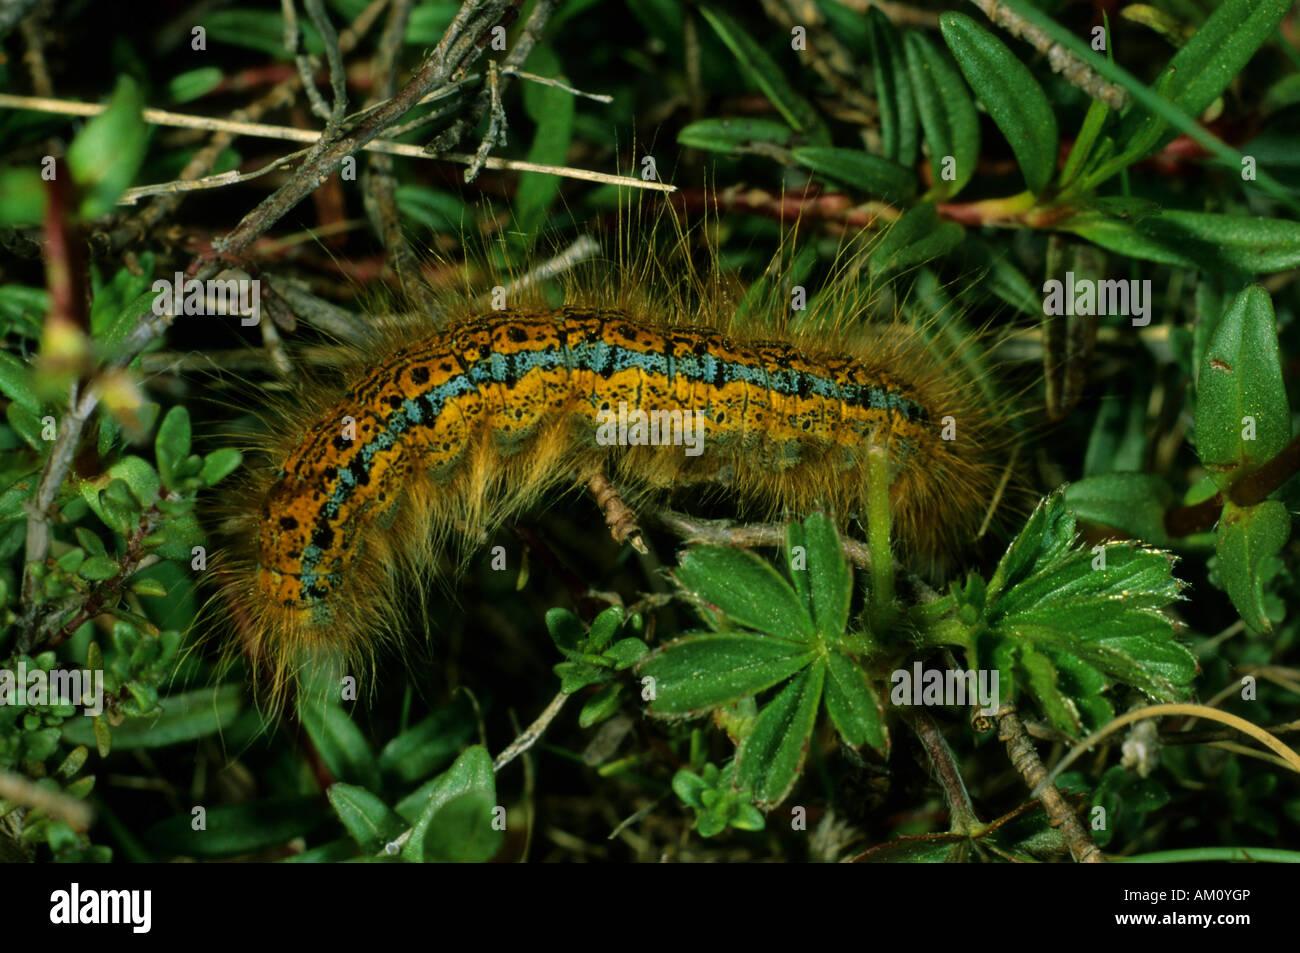 Ground Lackey, Malacosoma castrensis, caterpillar - Stock Image